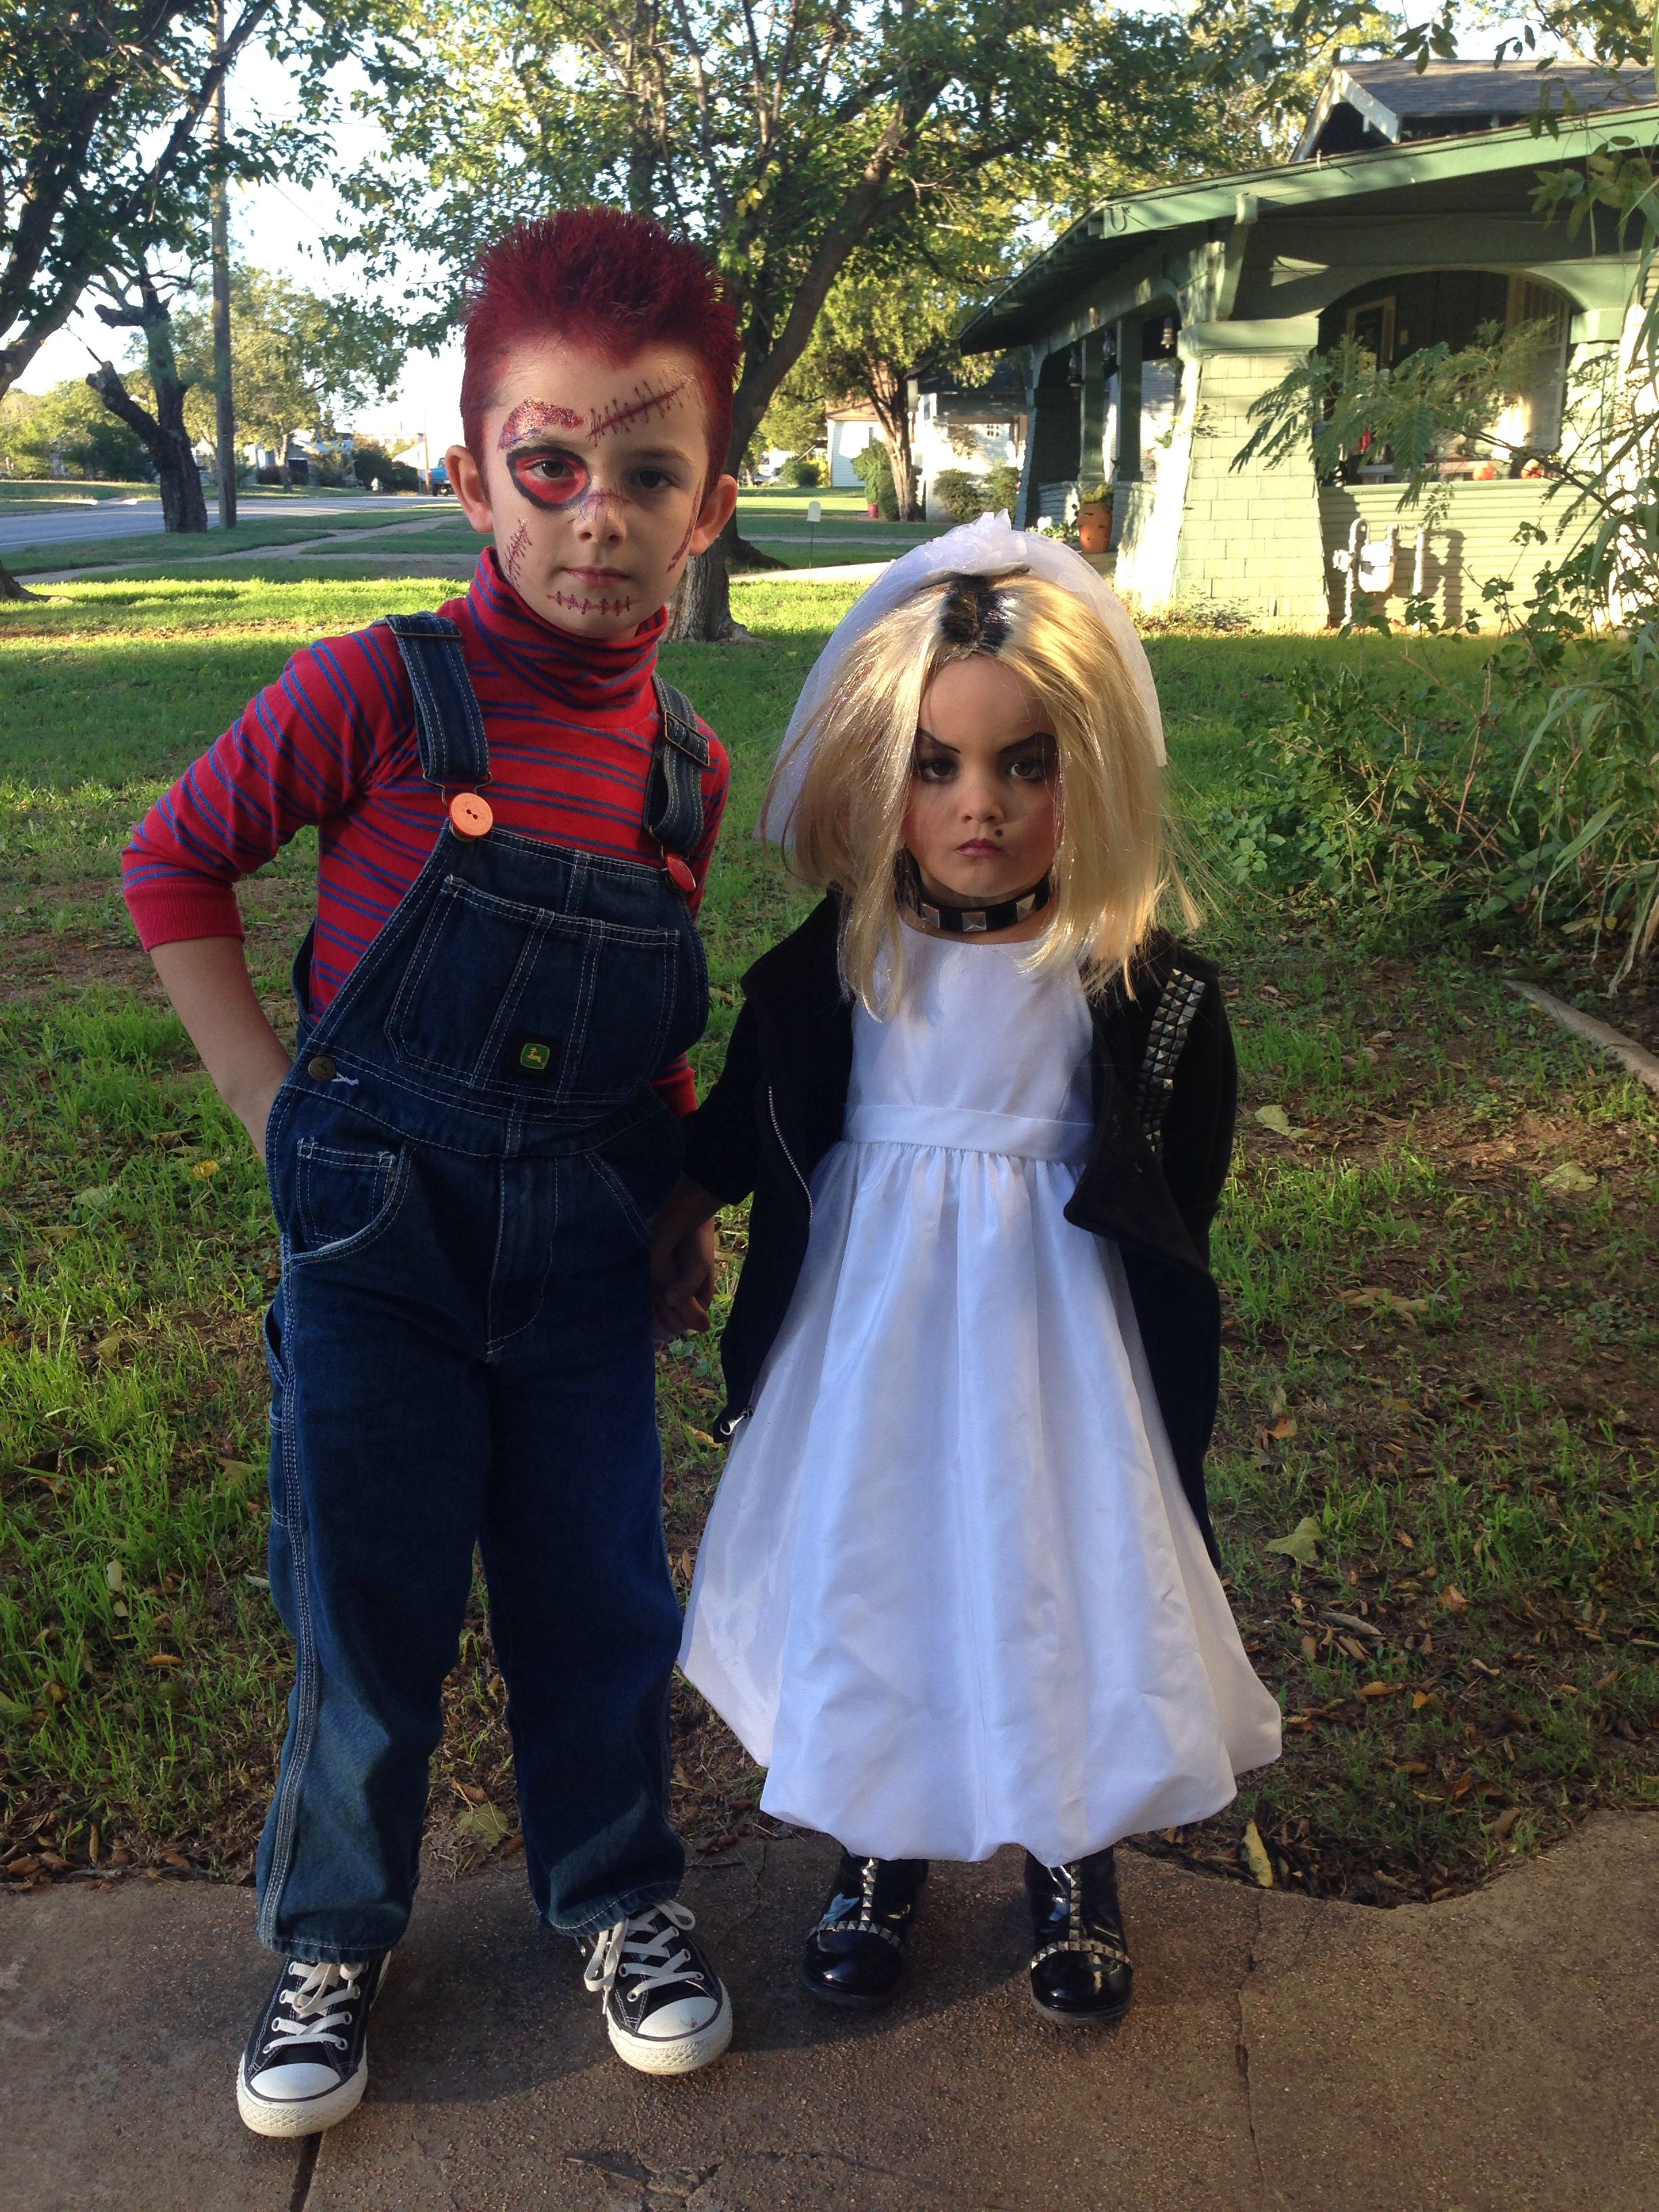 Chucky and bride of Chucky | halloween | Pinterest | Halloween parties